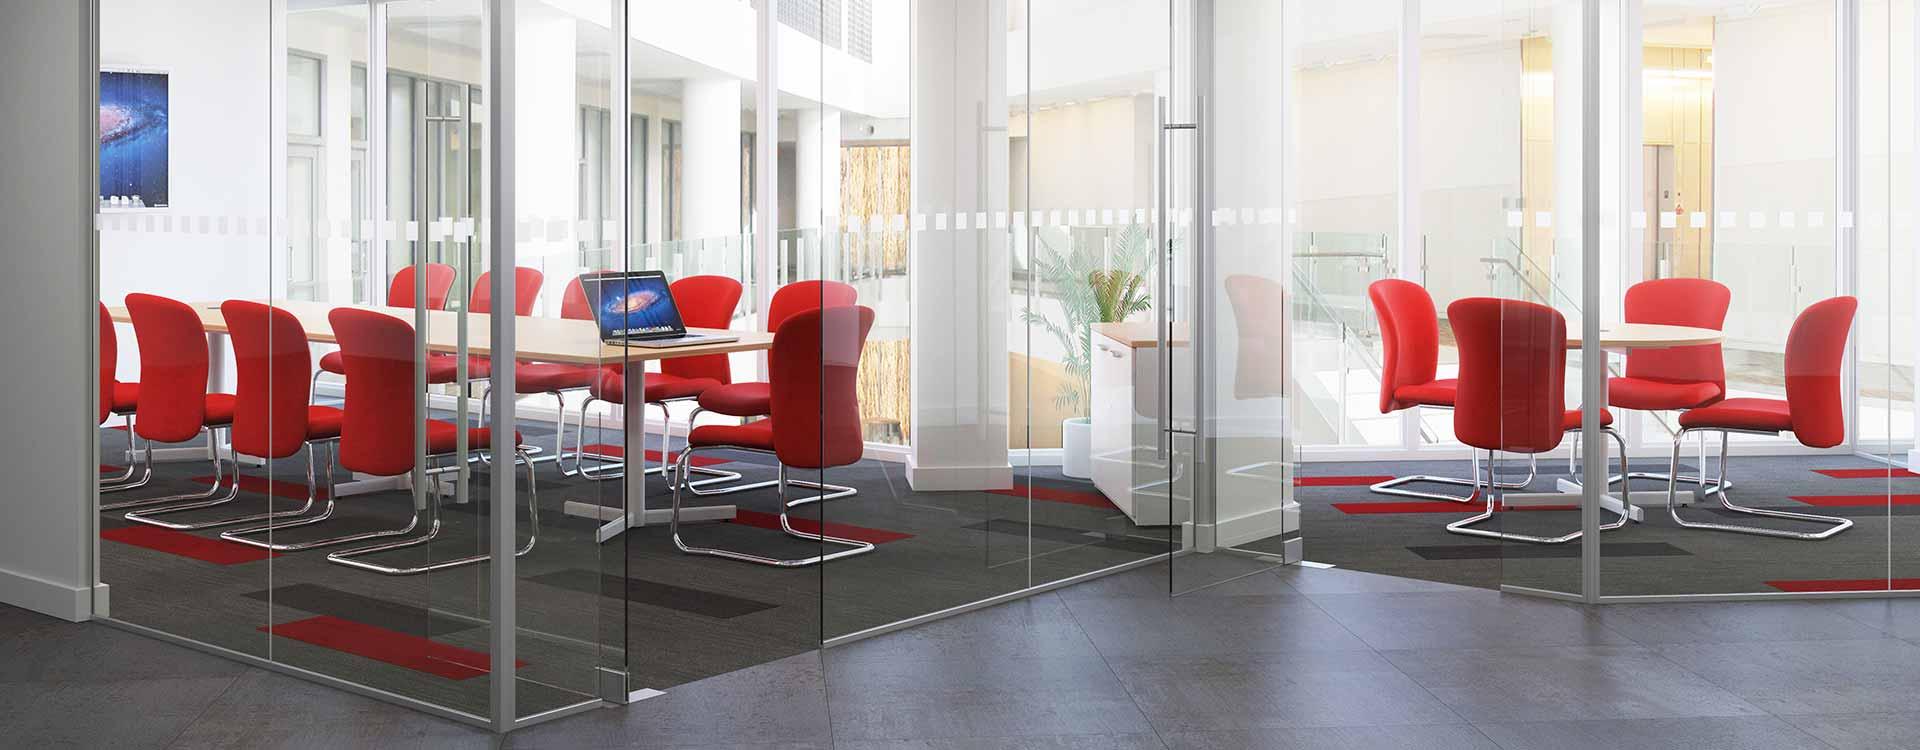 NCL Office Furniture Birmingam